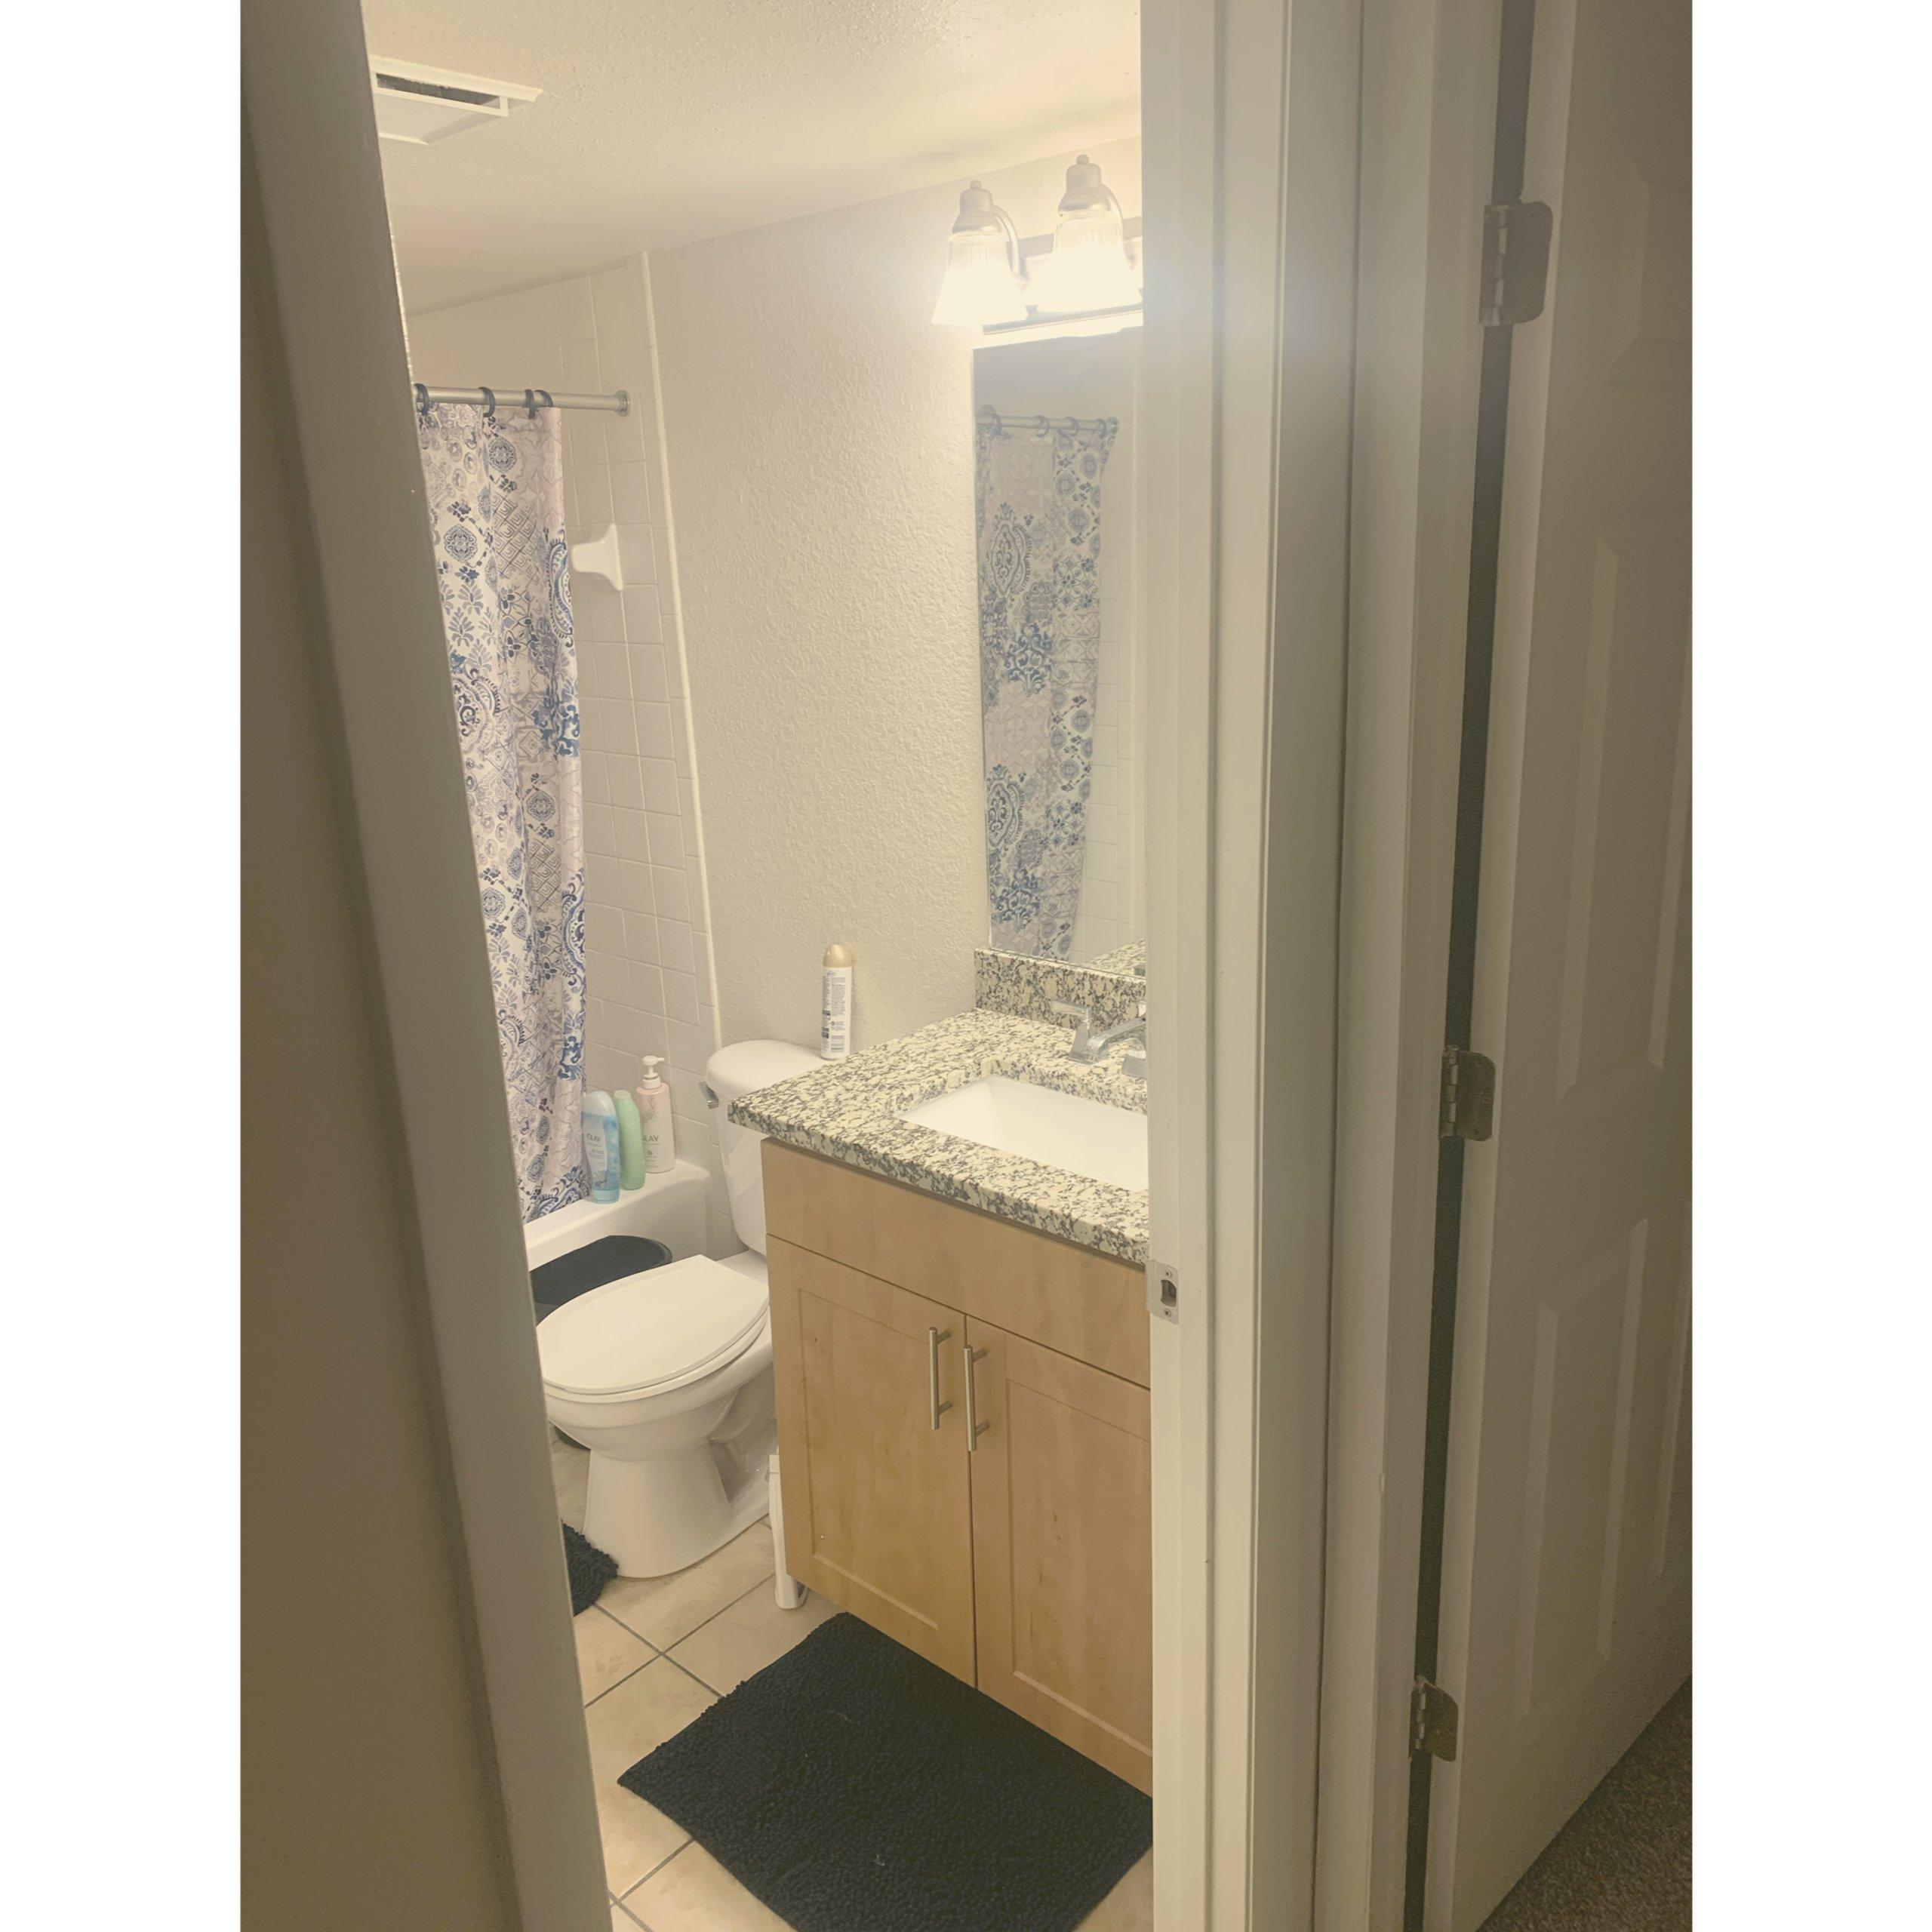 300x300 Bedroom self storage unit